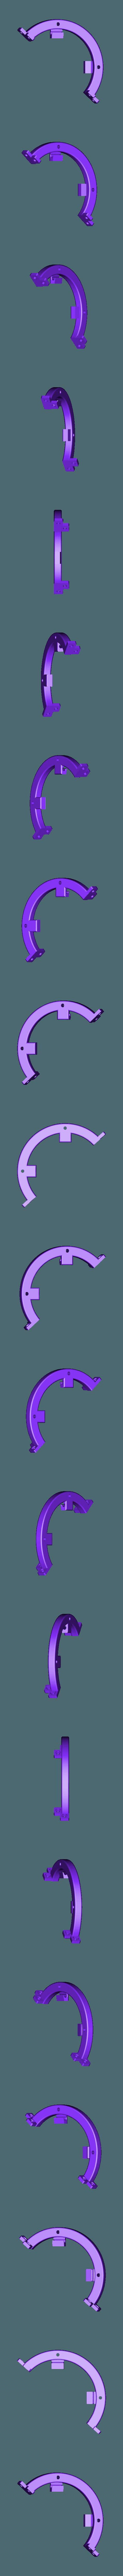 BoomExteriorBase_SIDE1.stl Download free STL file MXL 4000 Shock Mount (Custom) • 3D printer object, ProteanMan